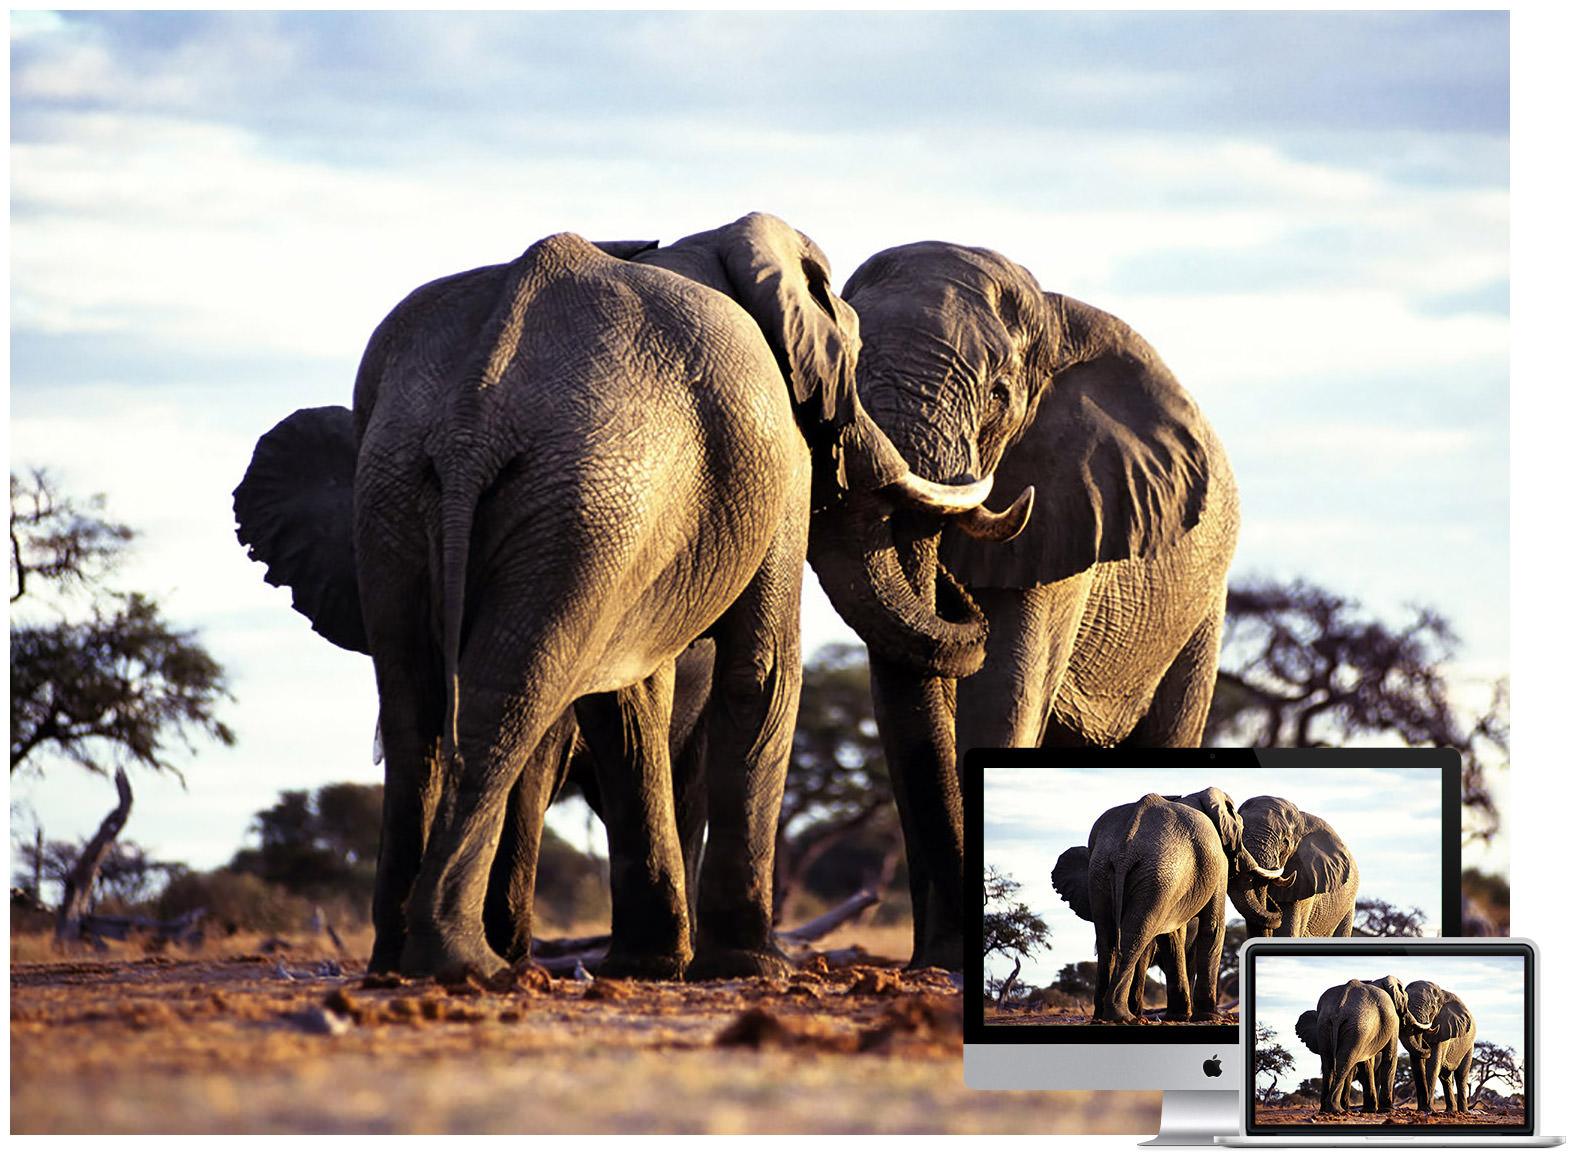 50 amazing wildlife animal wallpapers hongkiat beautiful horses voltagebd Image collections